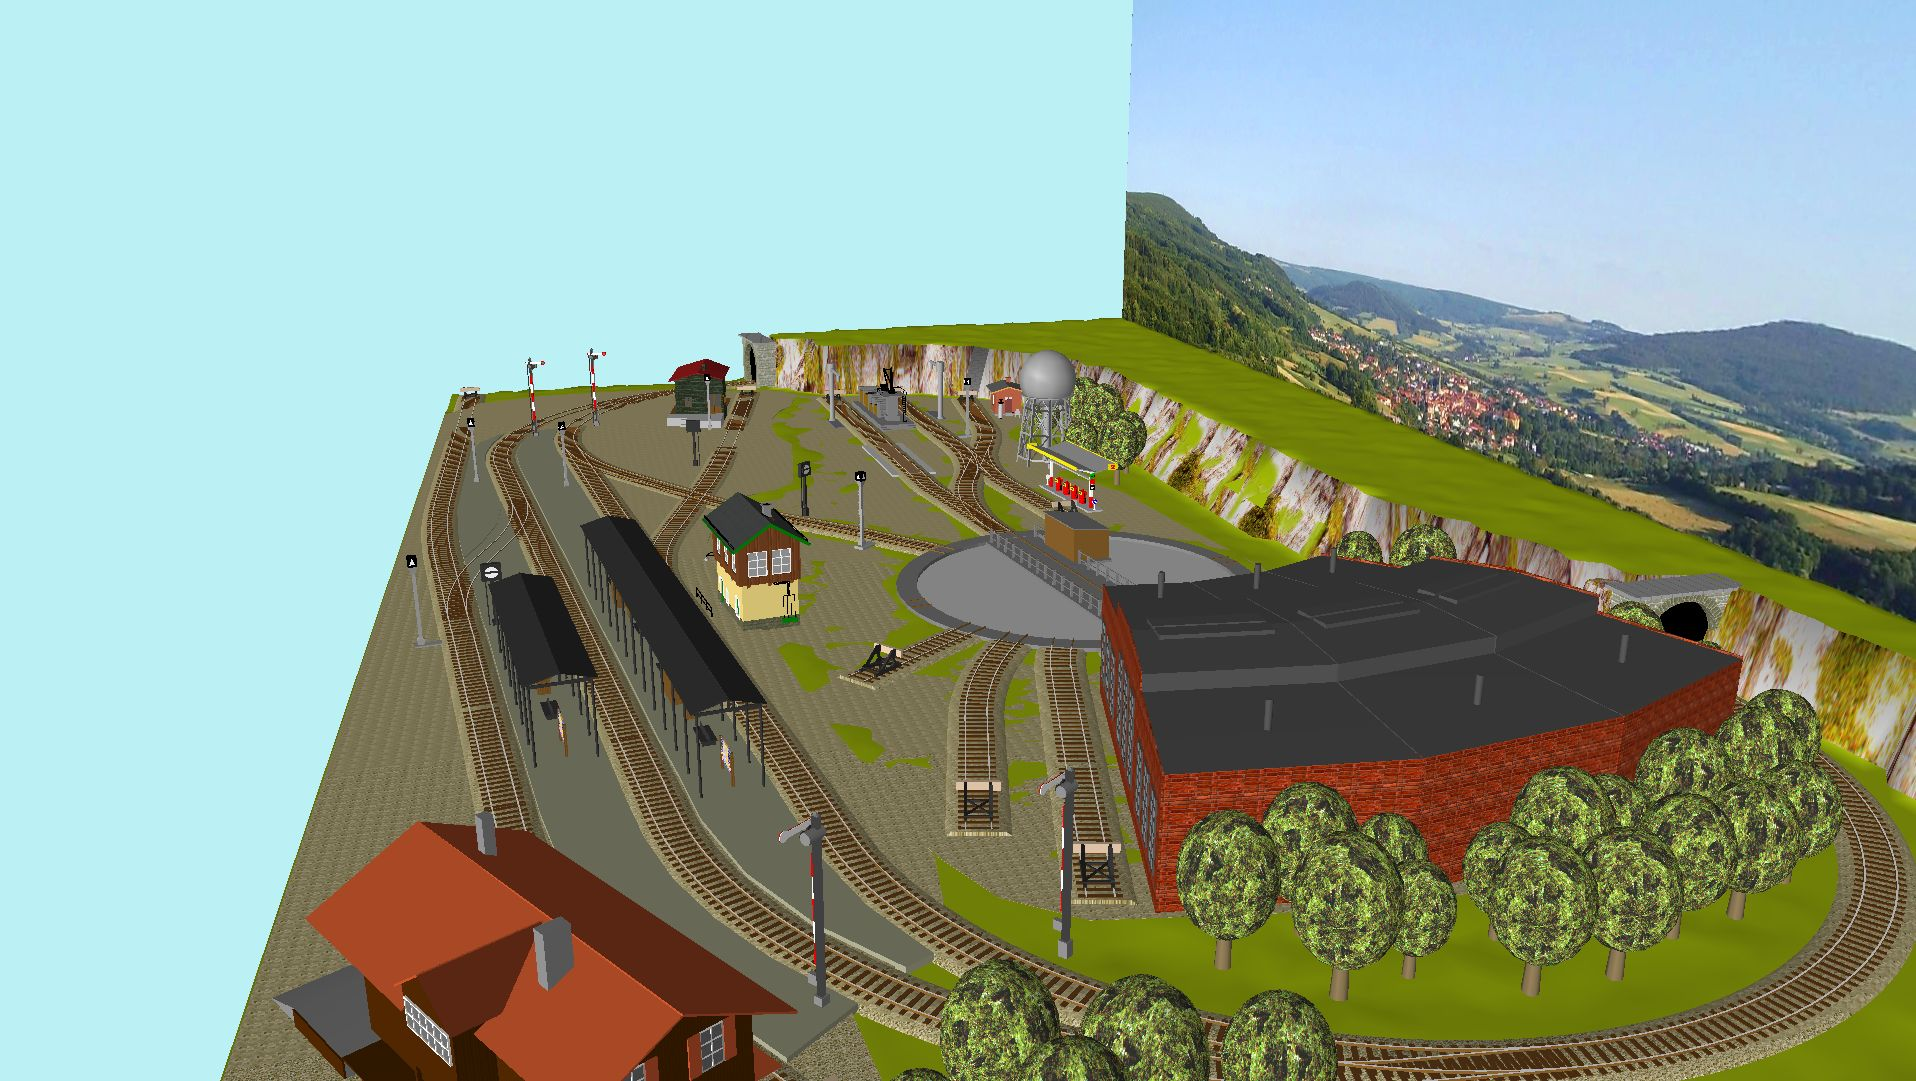 'ALBA Modellbahnpraxis' Band 1, Plan 5 Amp-1_5_bw_10vj7n